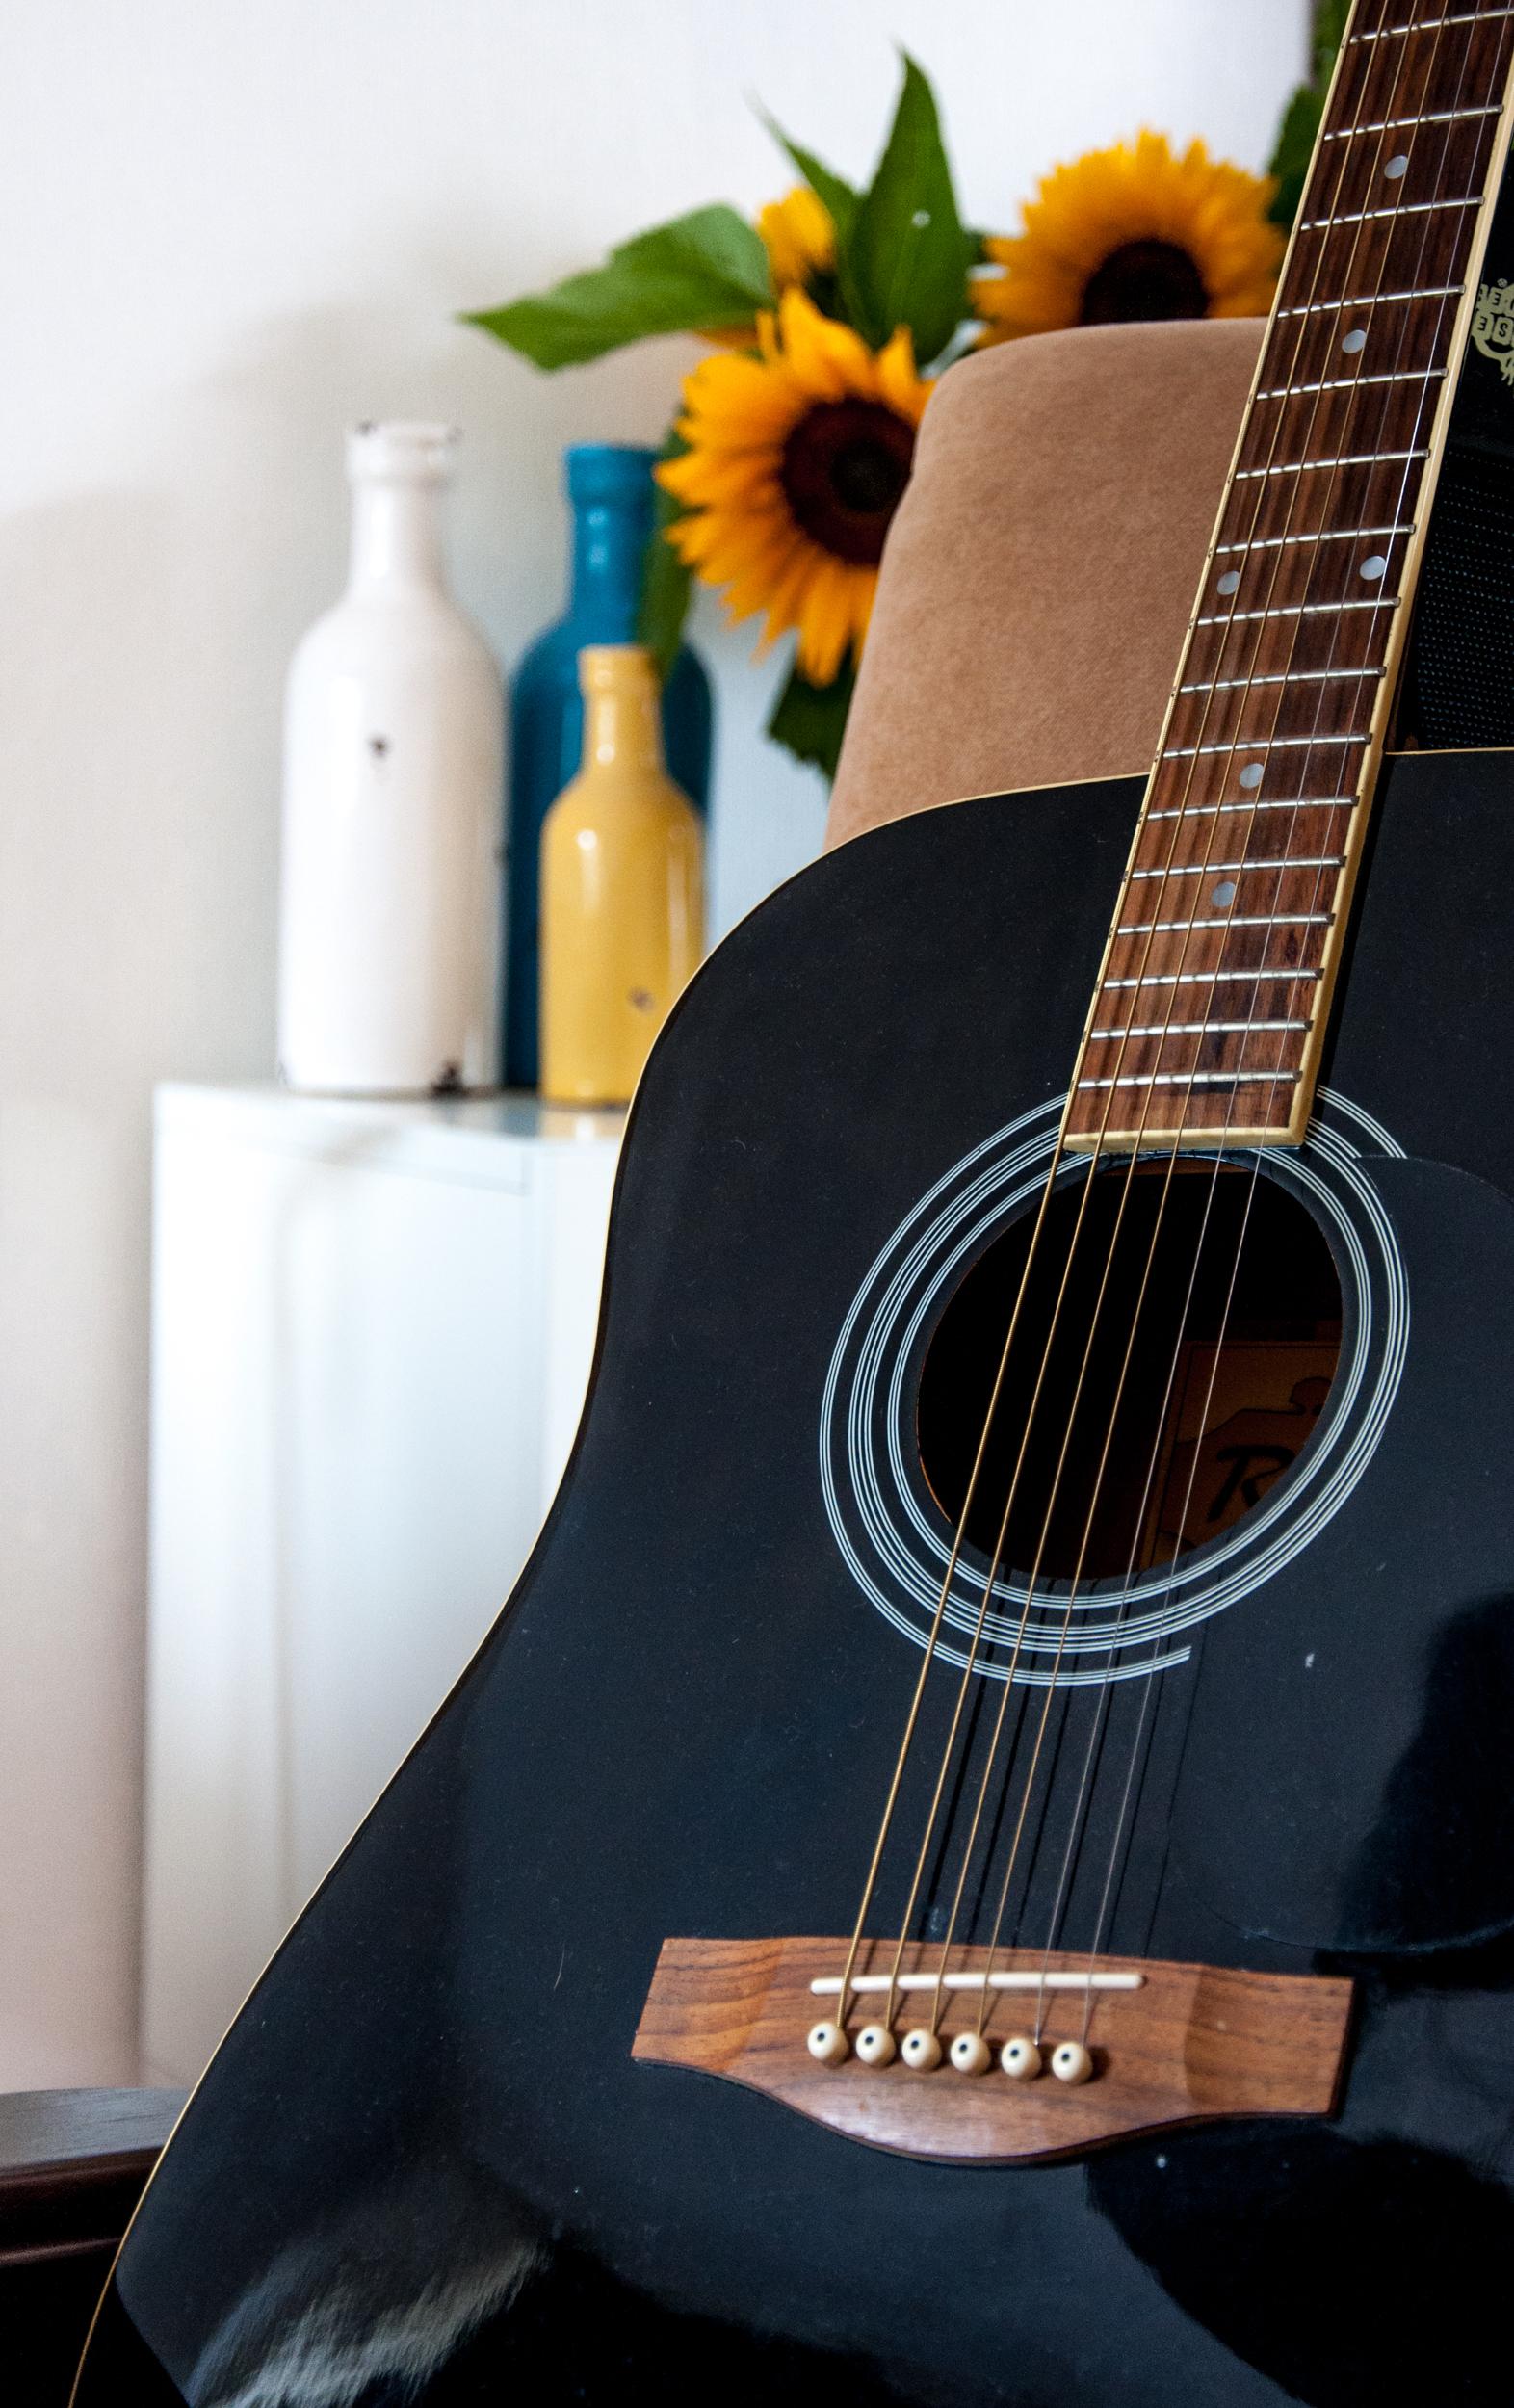 Guitar, Nylon, Tube, System, String, HQ Photo